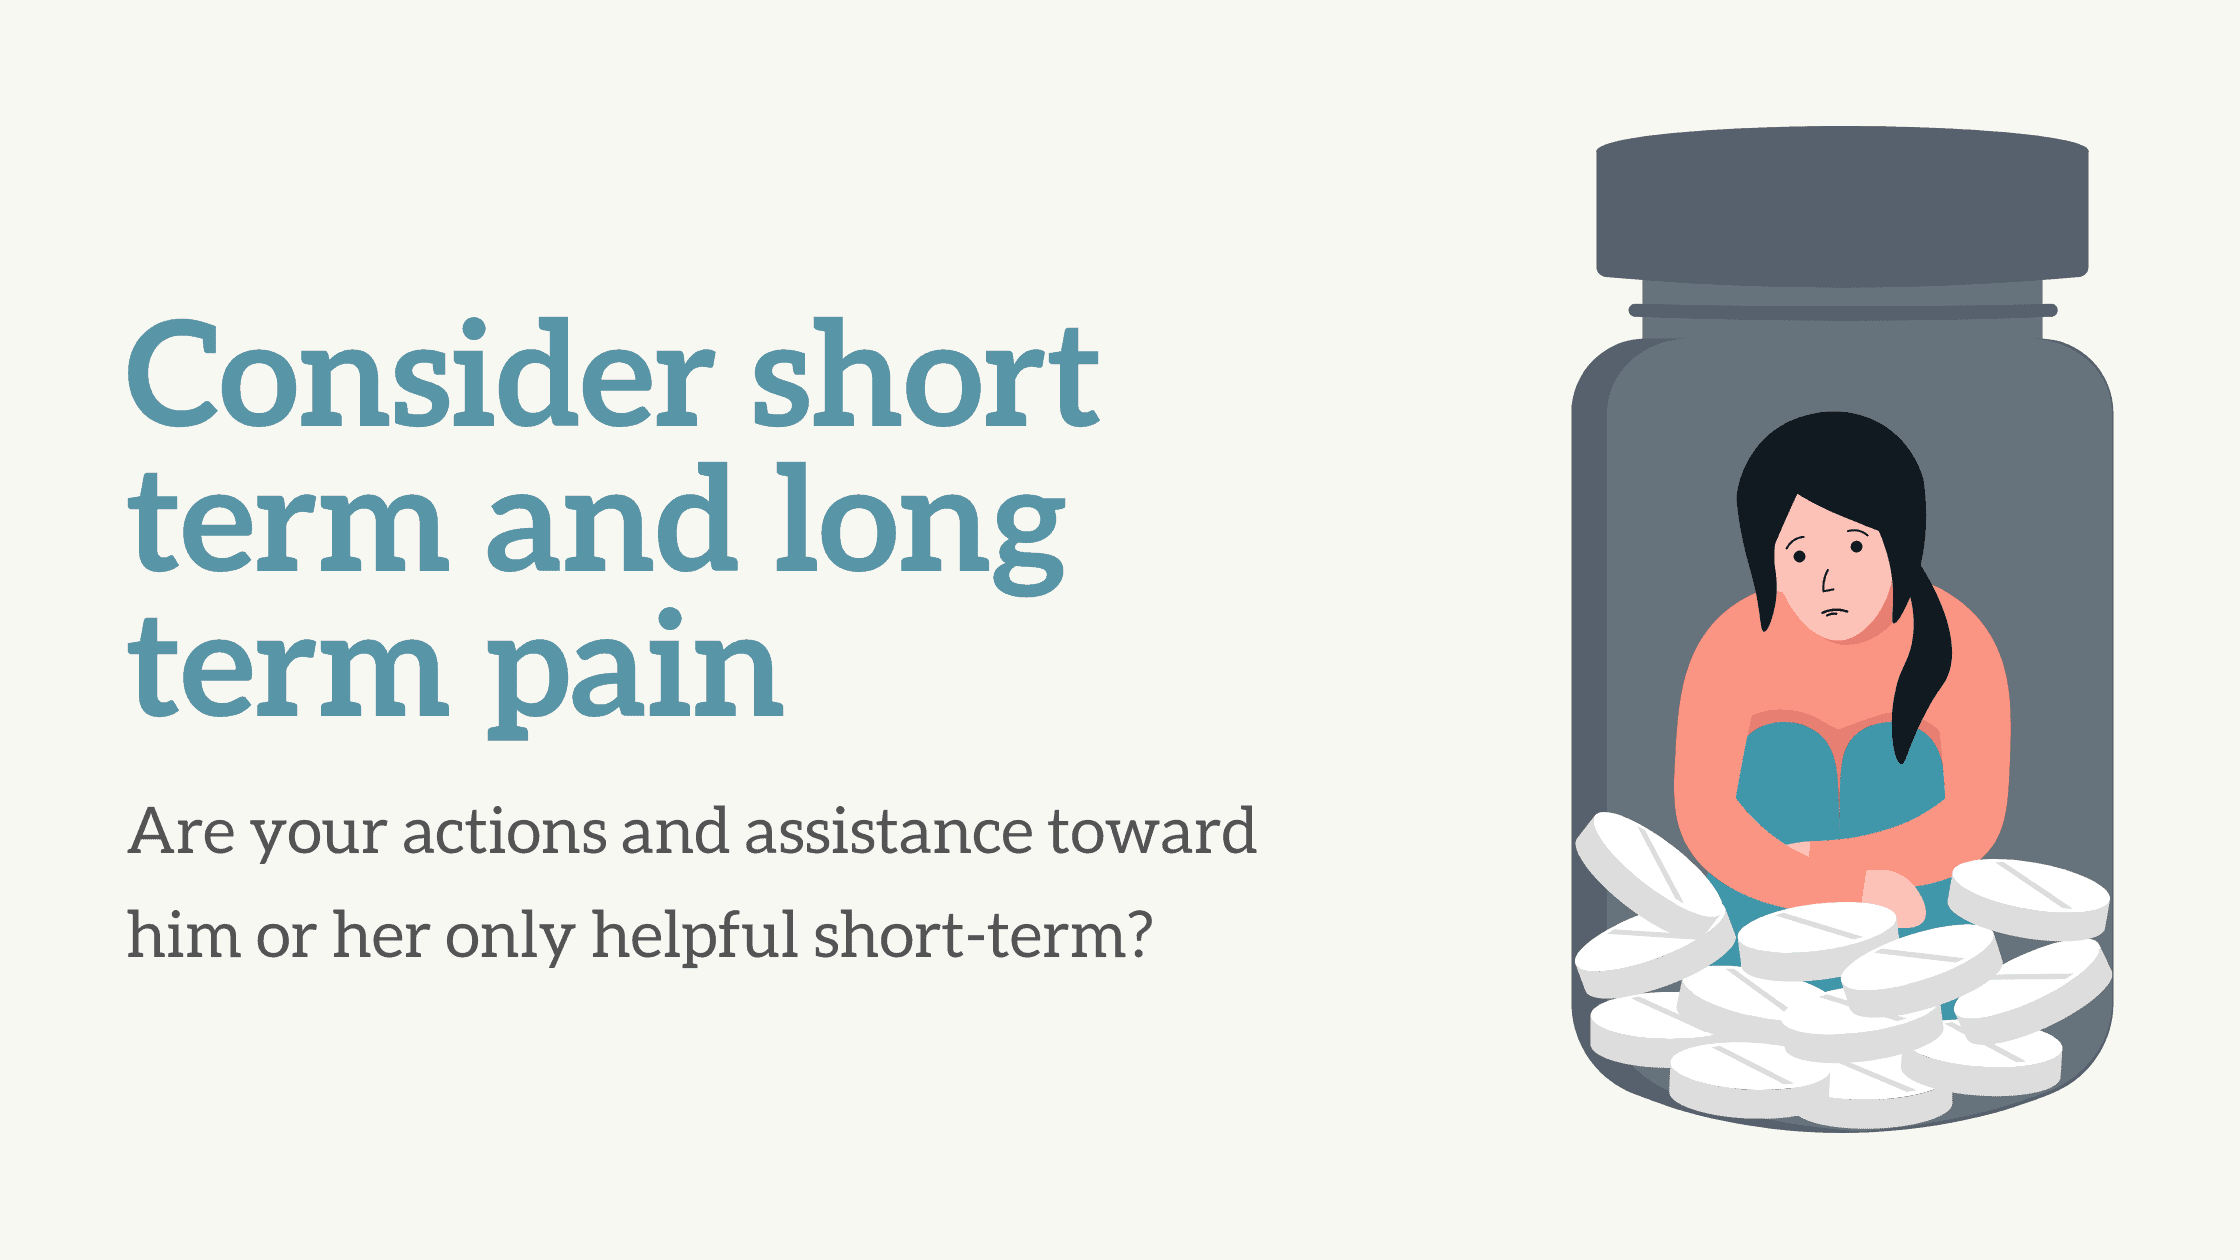 Consider short term and long term pain